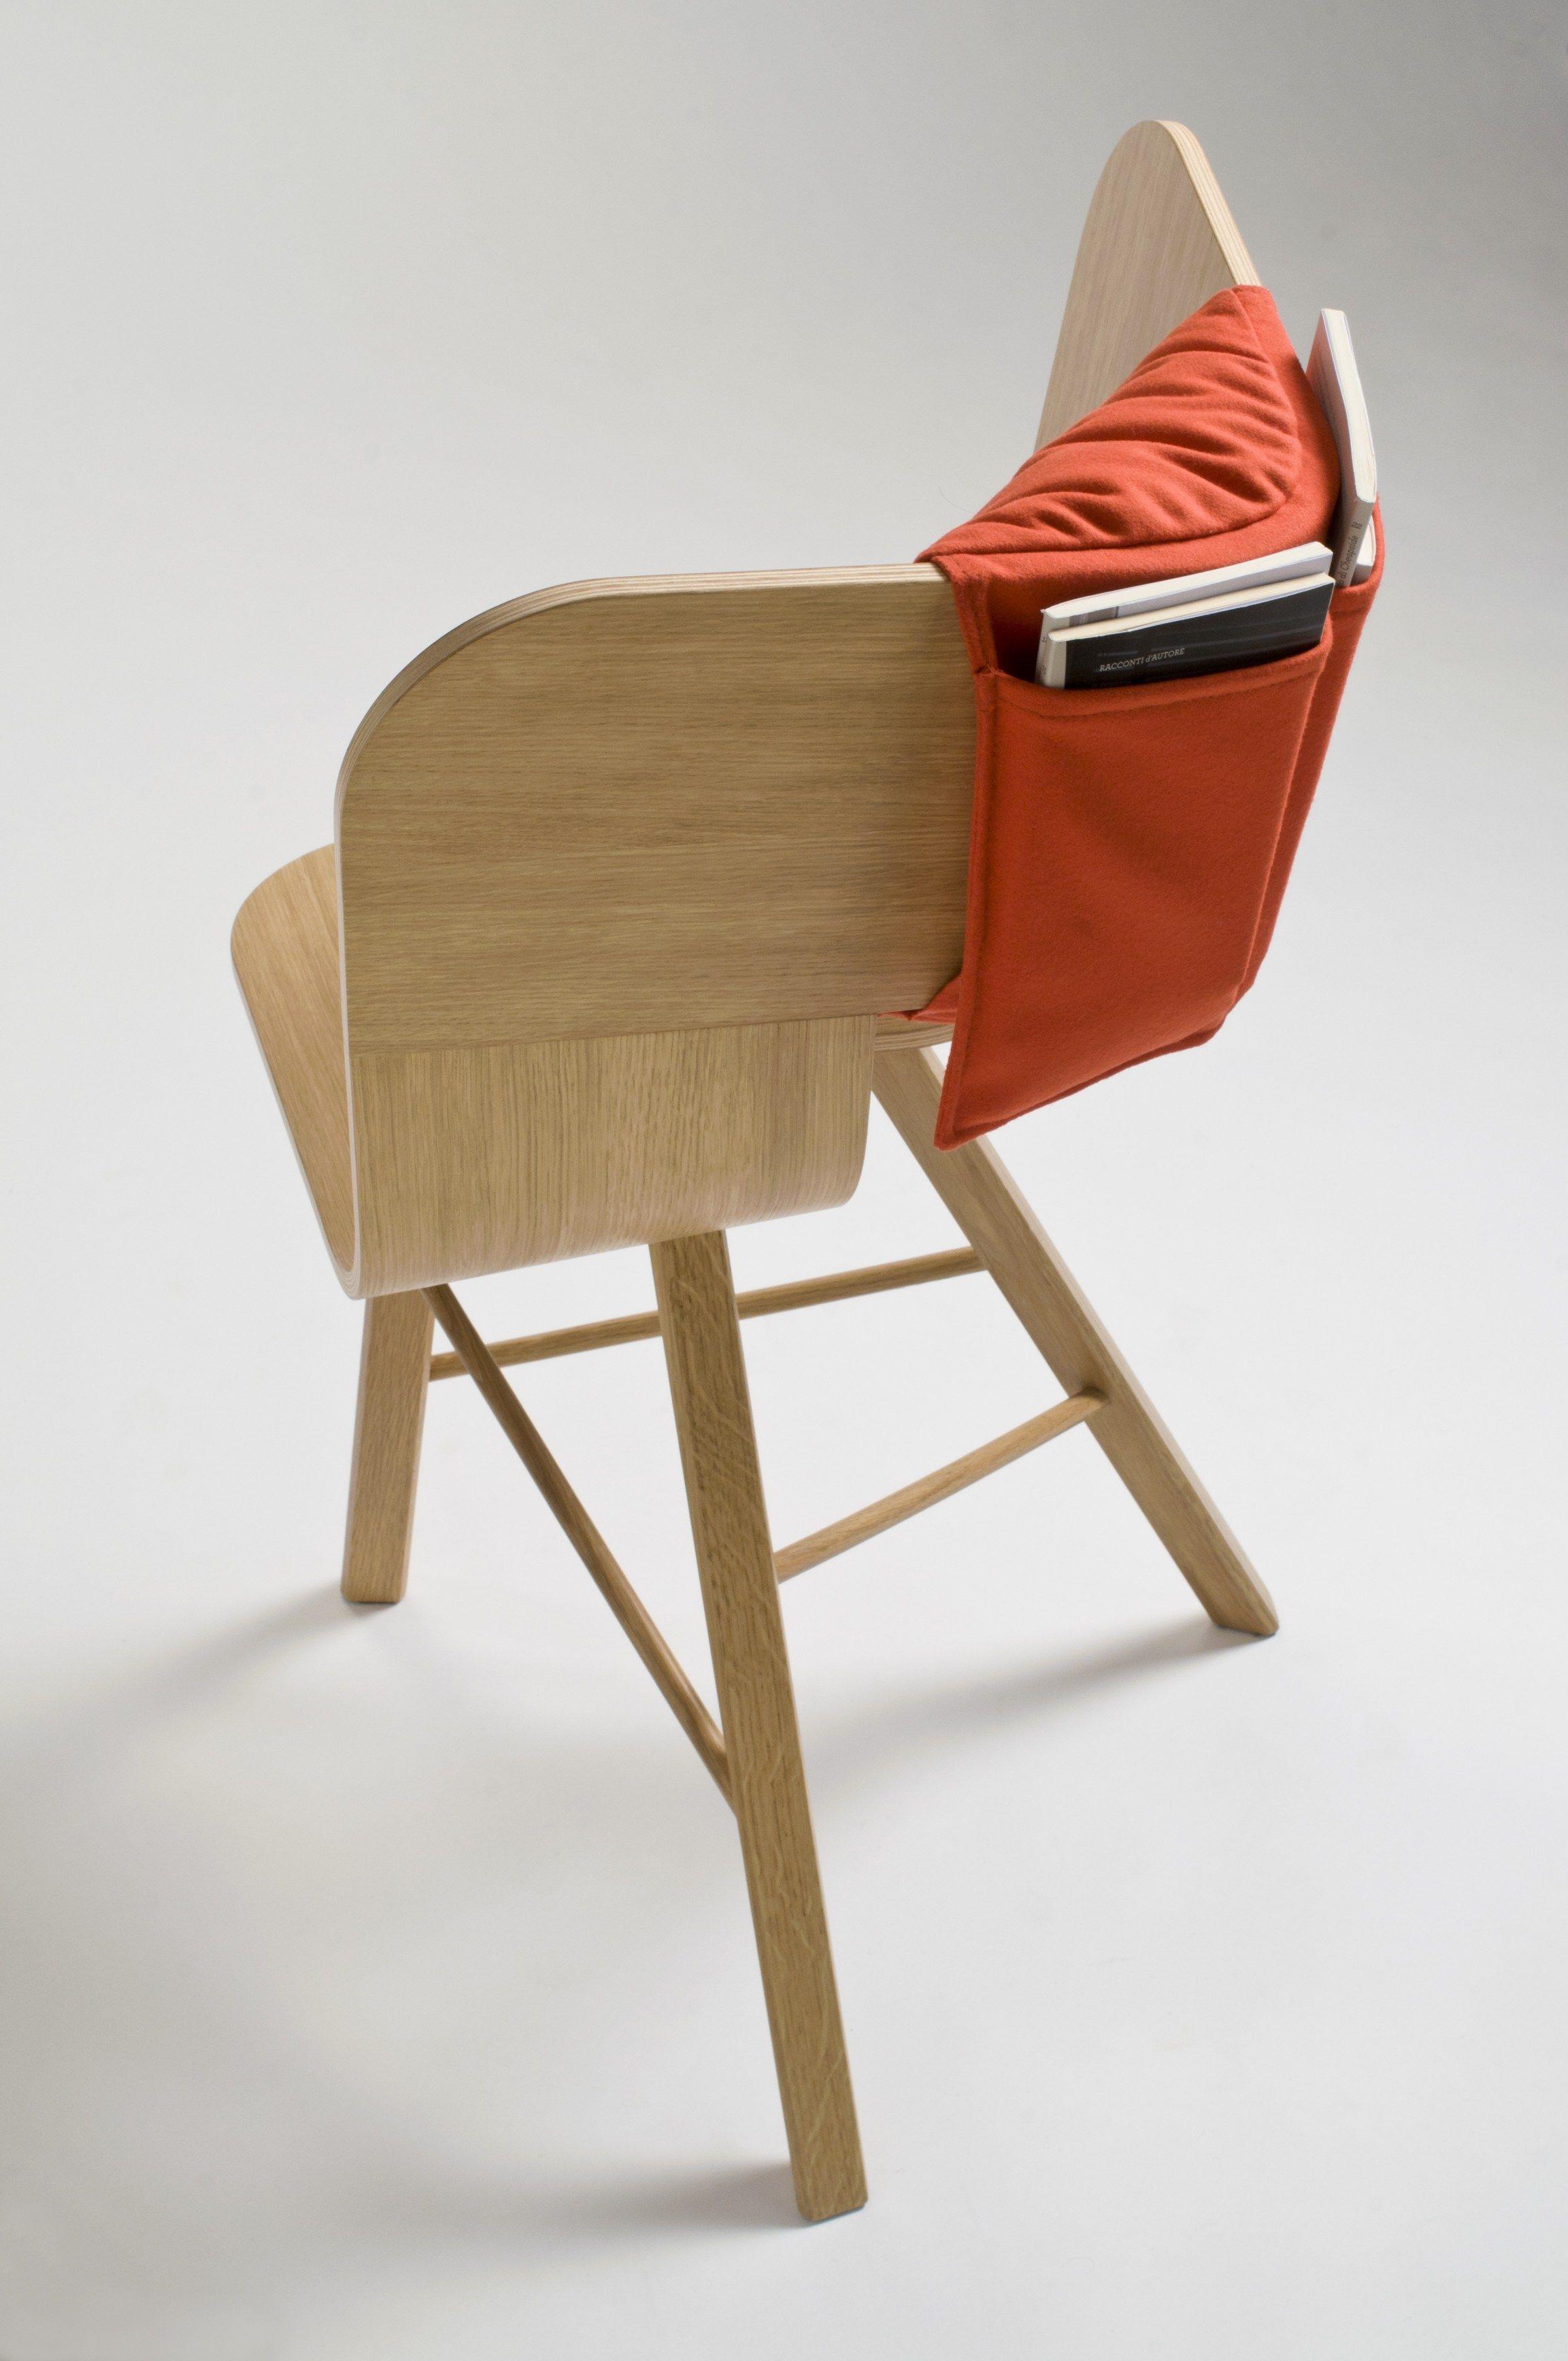 Tria Wood Chair By Col 233 Italian Design Label Design Lorenz Kaz